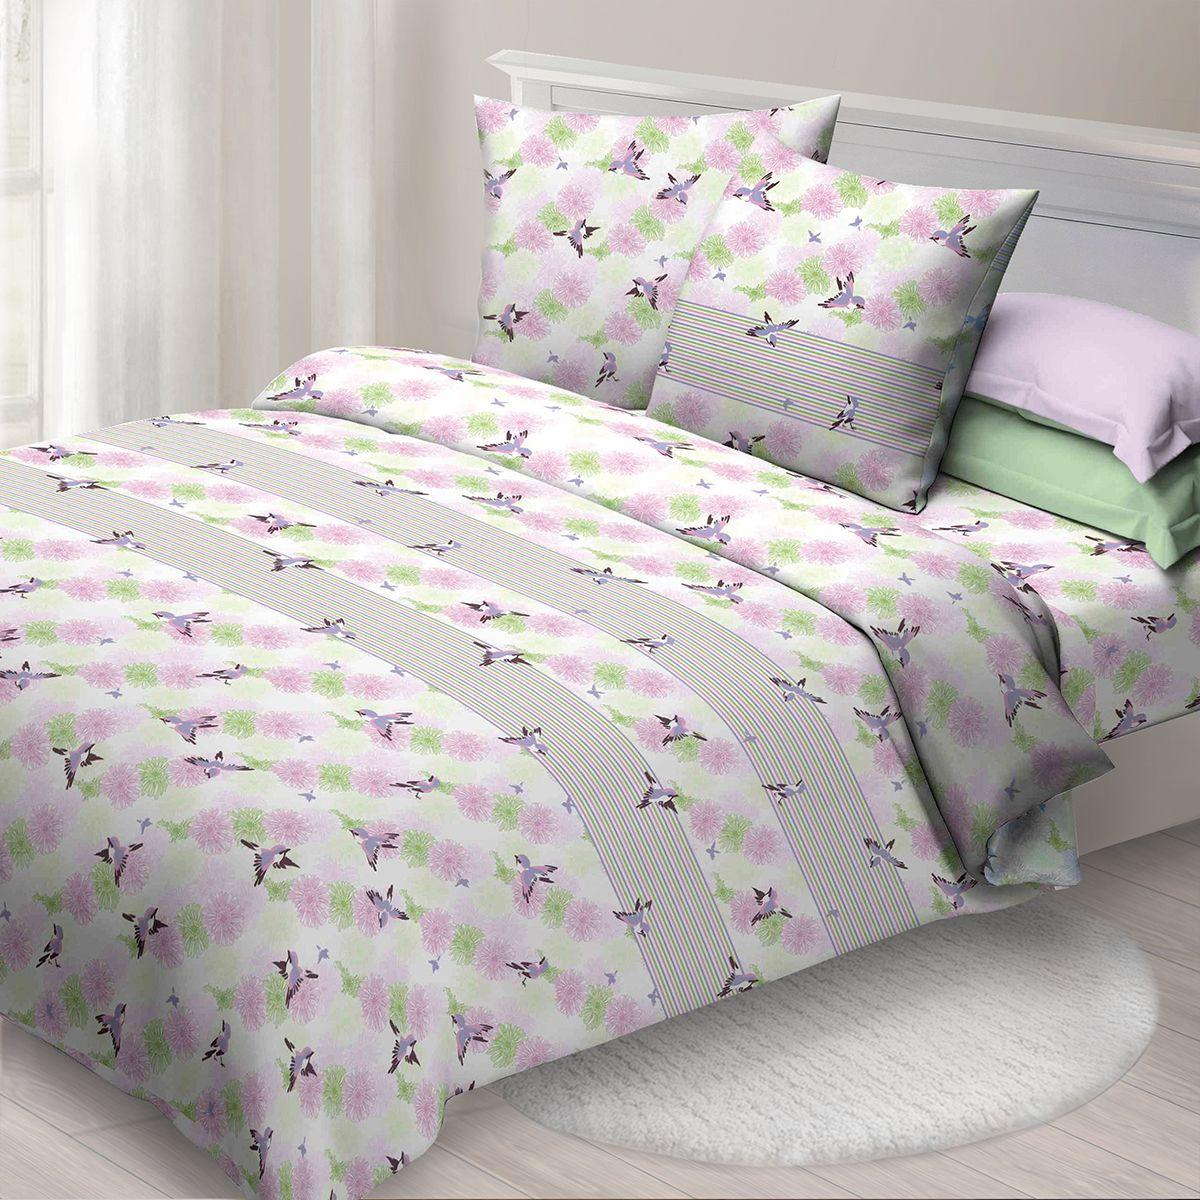 Комплект белья Спал Спалыч Ариана, евро, наволочки 70x70, цвет: розовый. 4085-184200